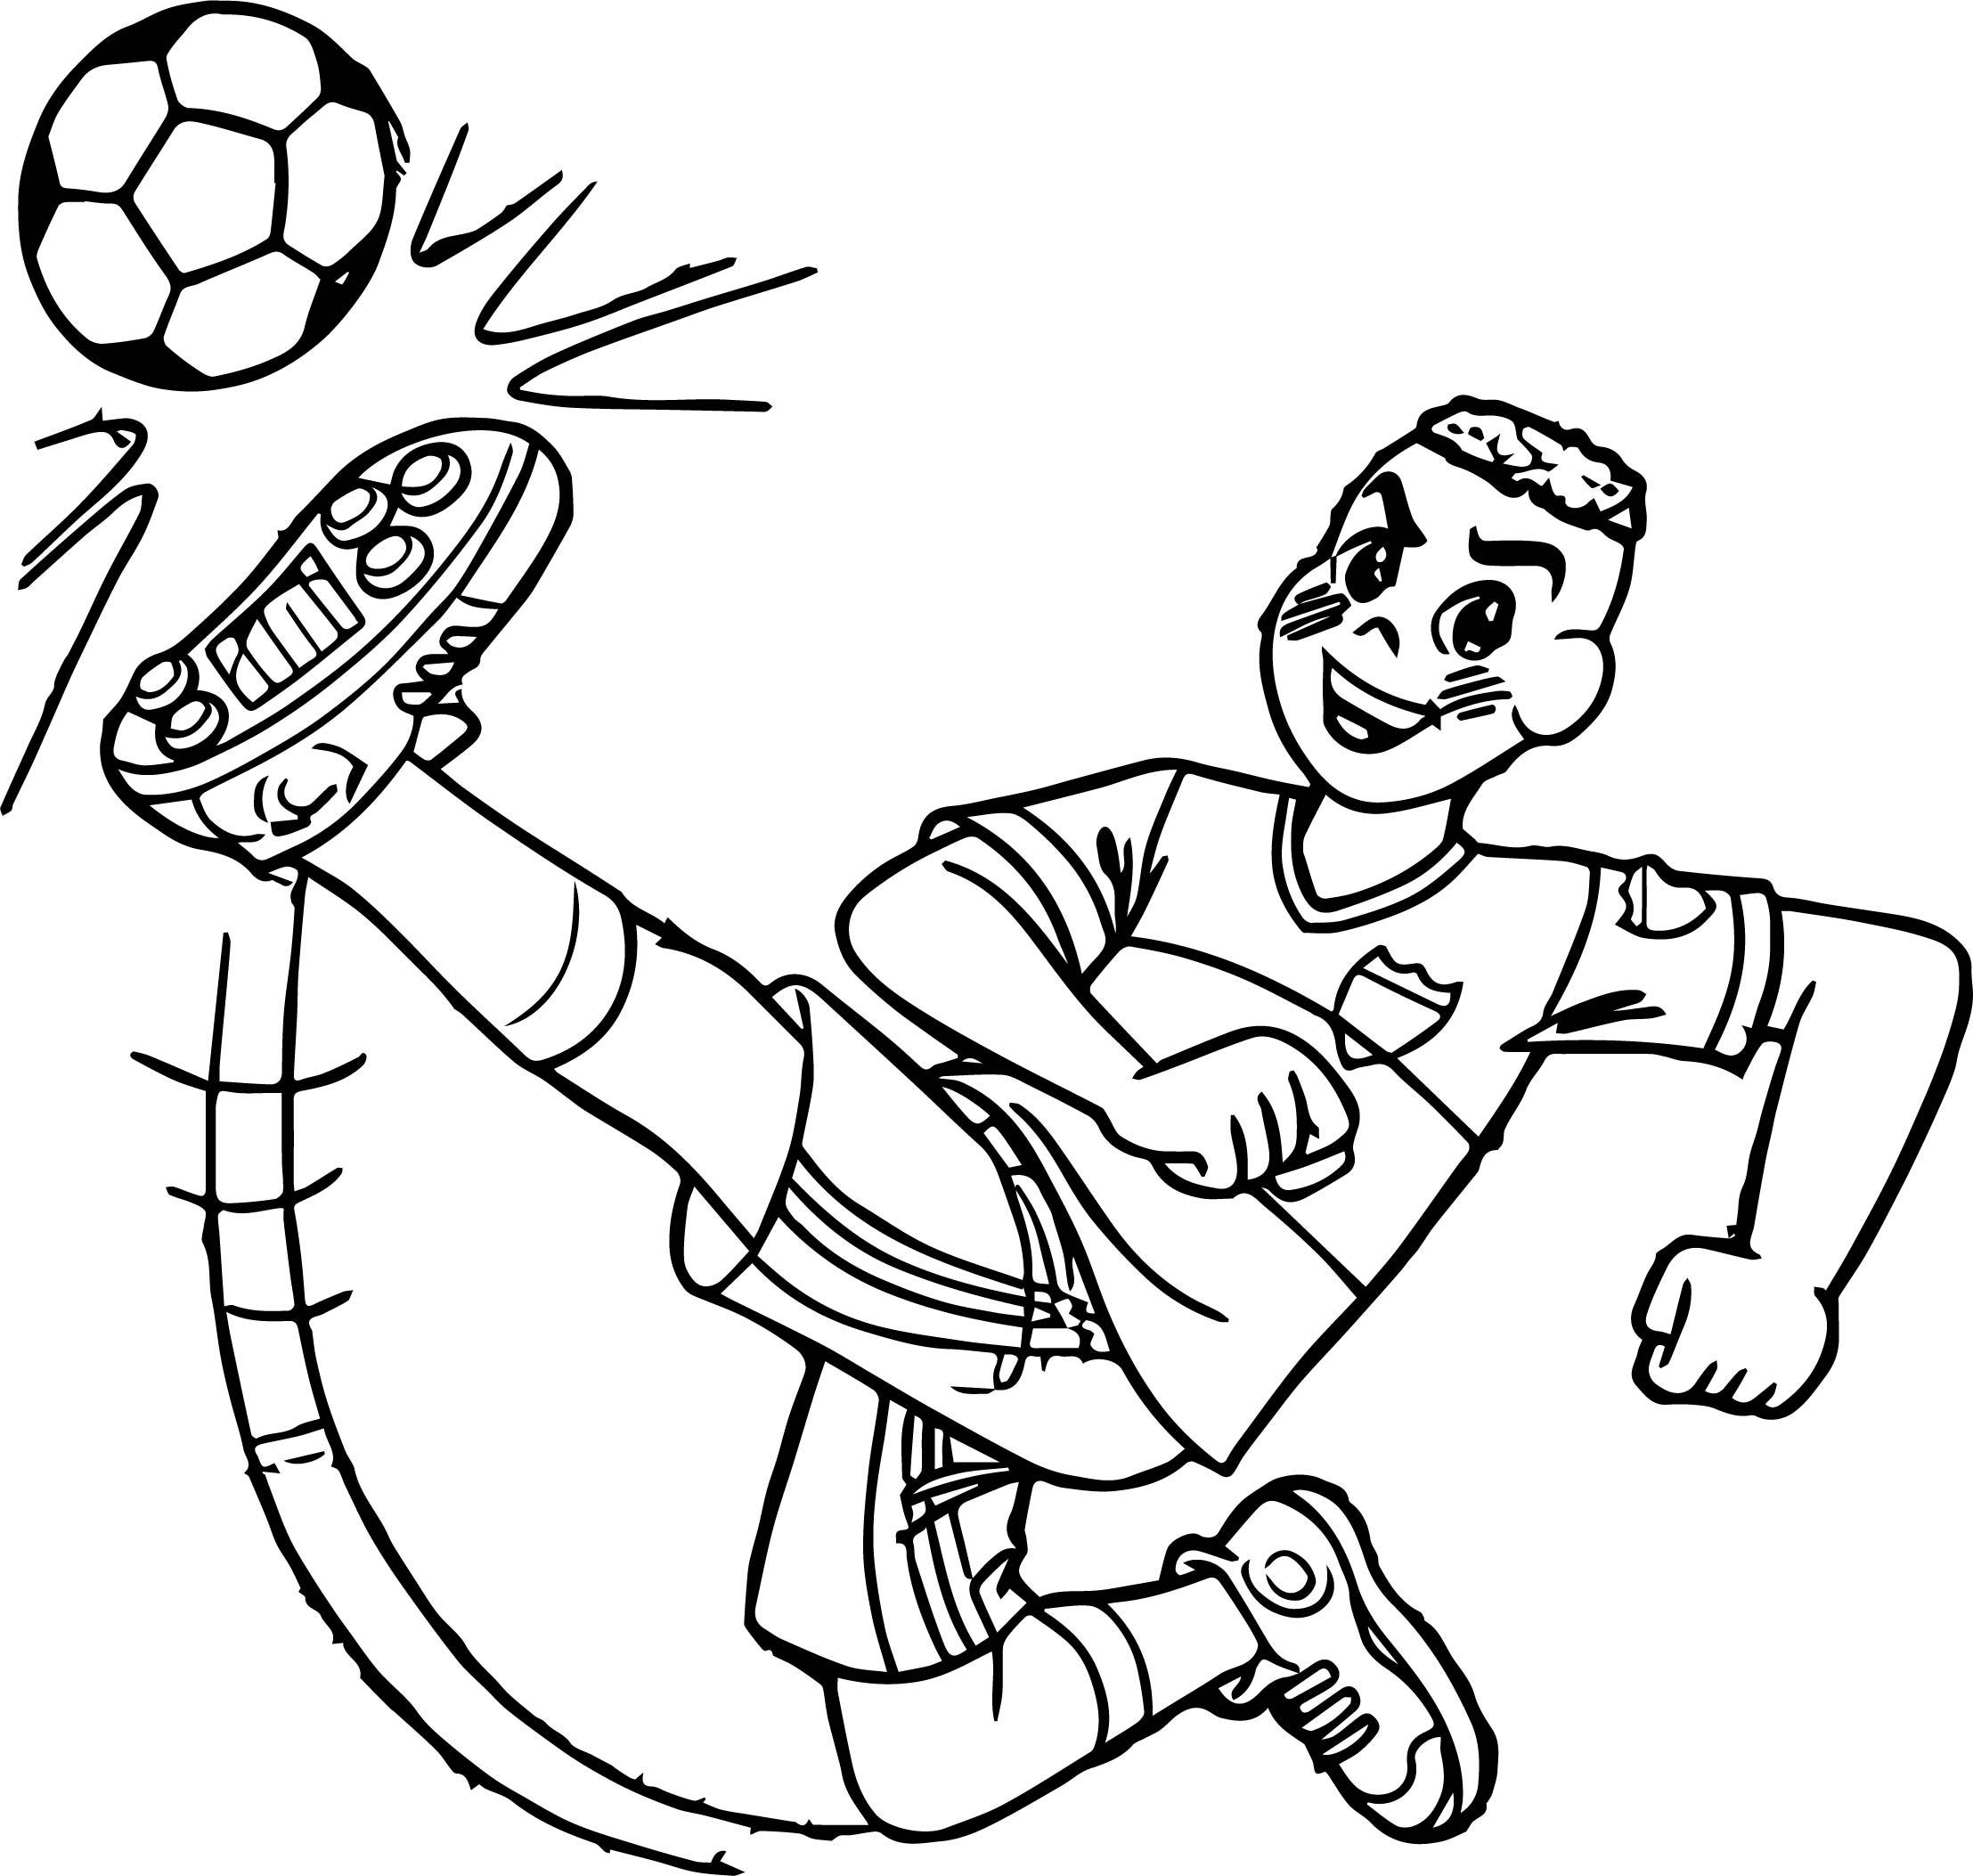 Cascao Boy Kicking Ball Coloring Page Wecoloringpage